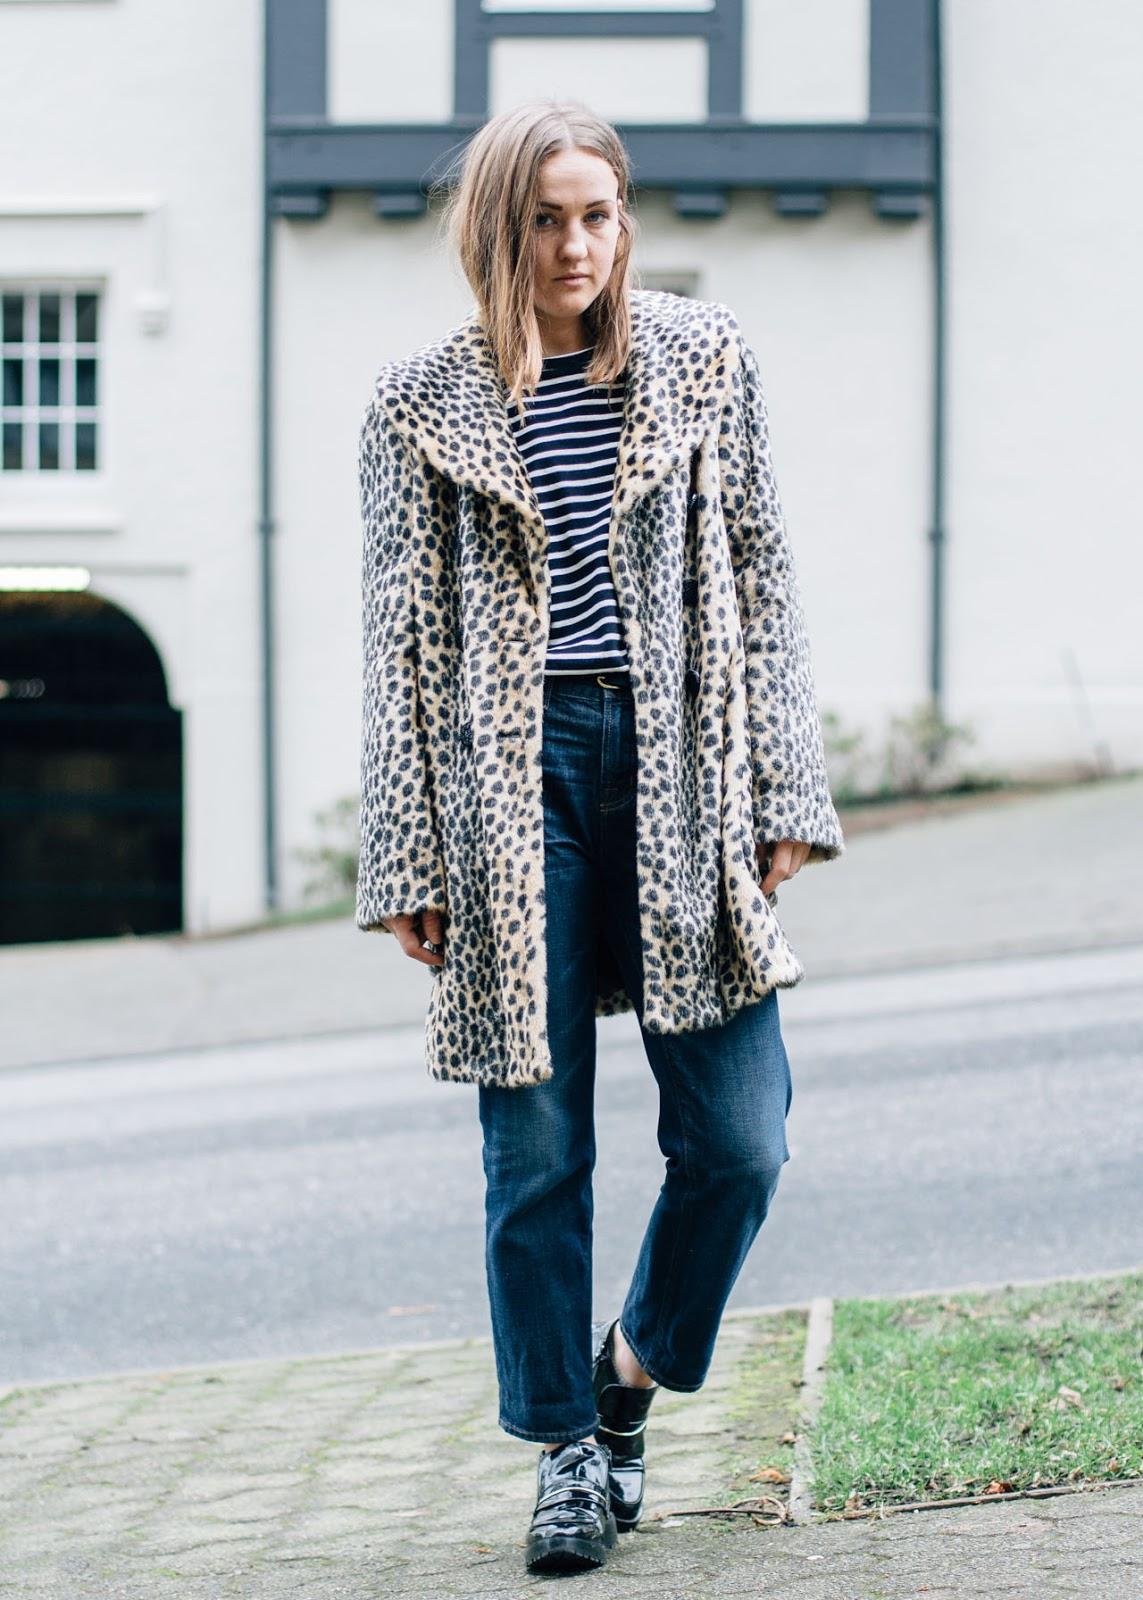 Wardrobe staples - Timeless classics - basics - Vancouver Fashion Blog